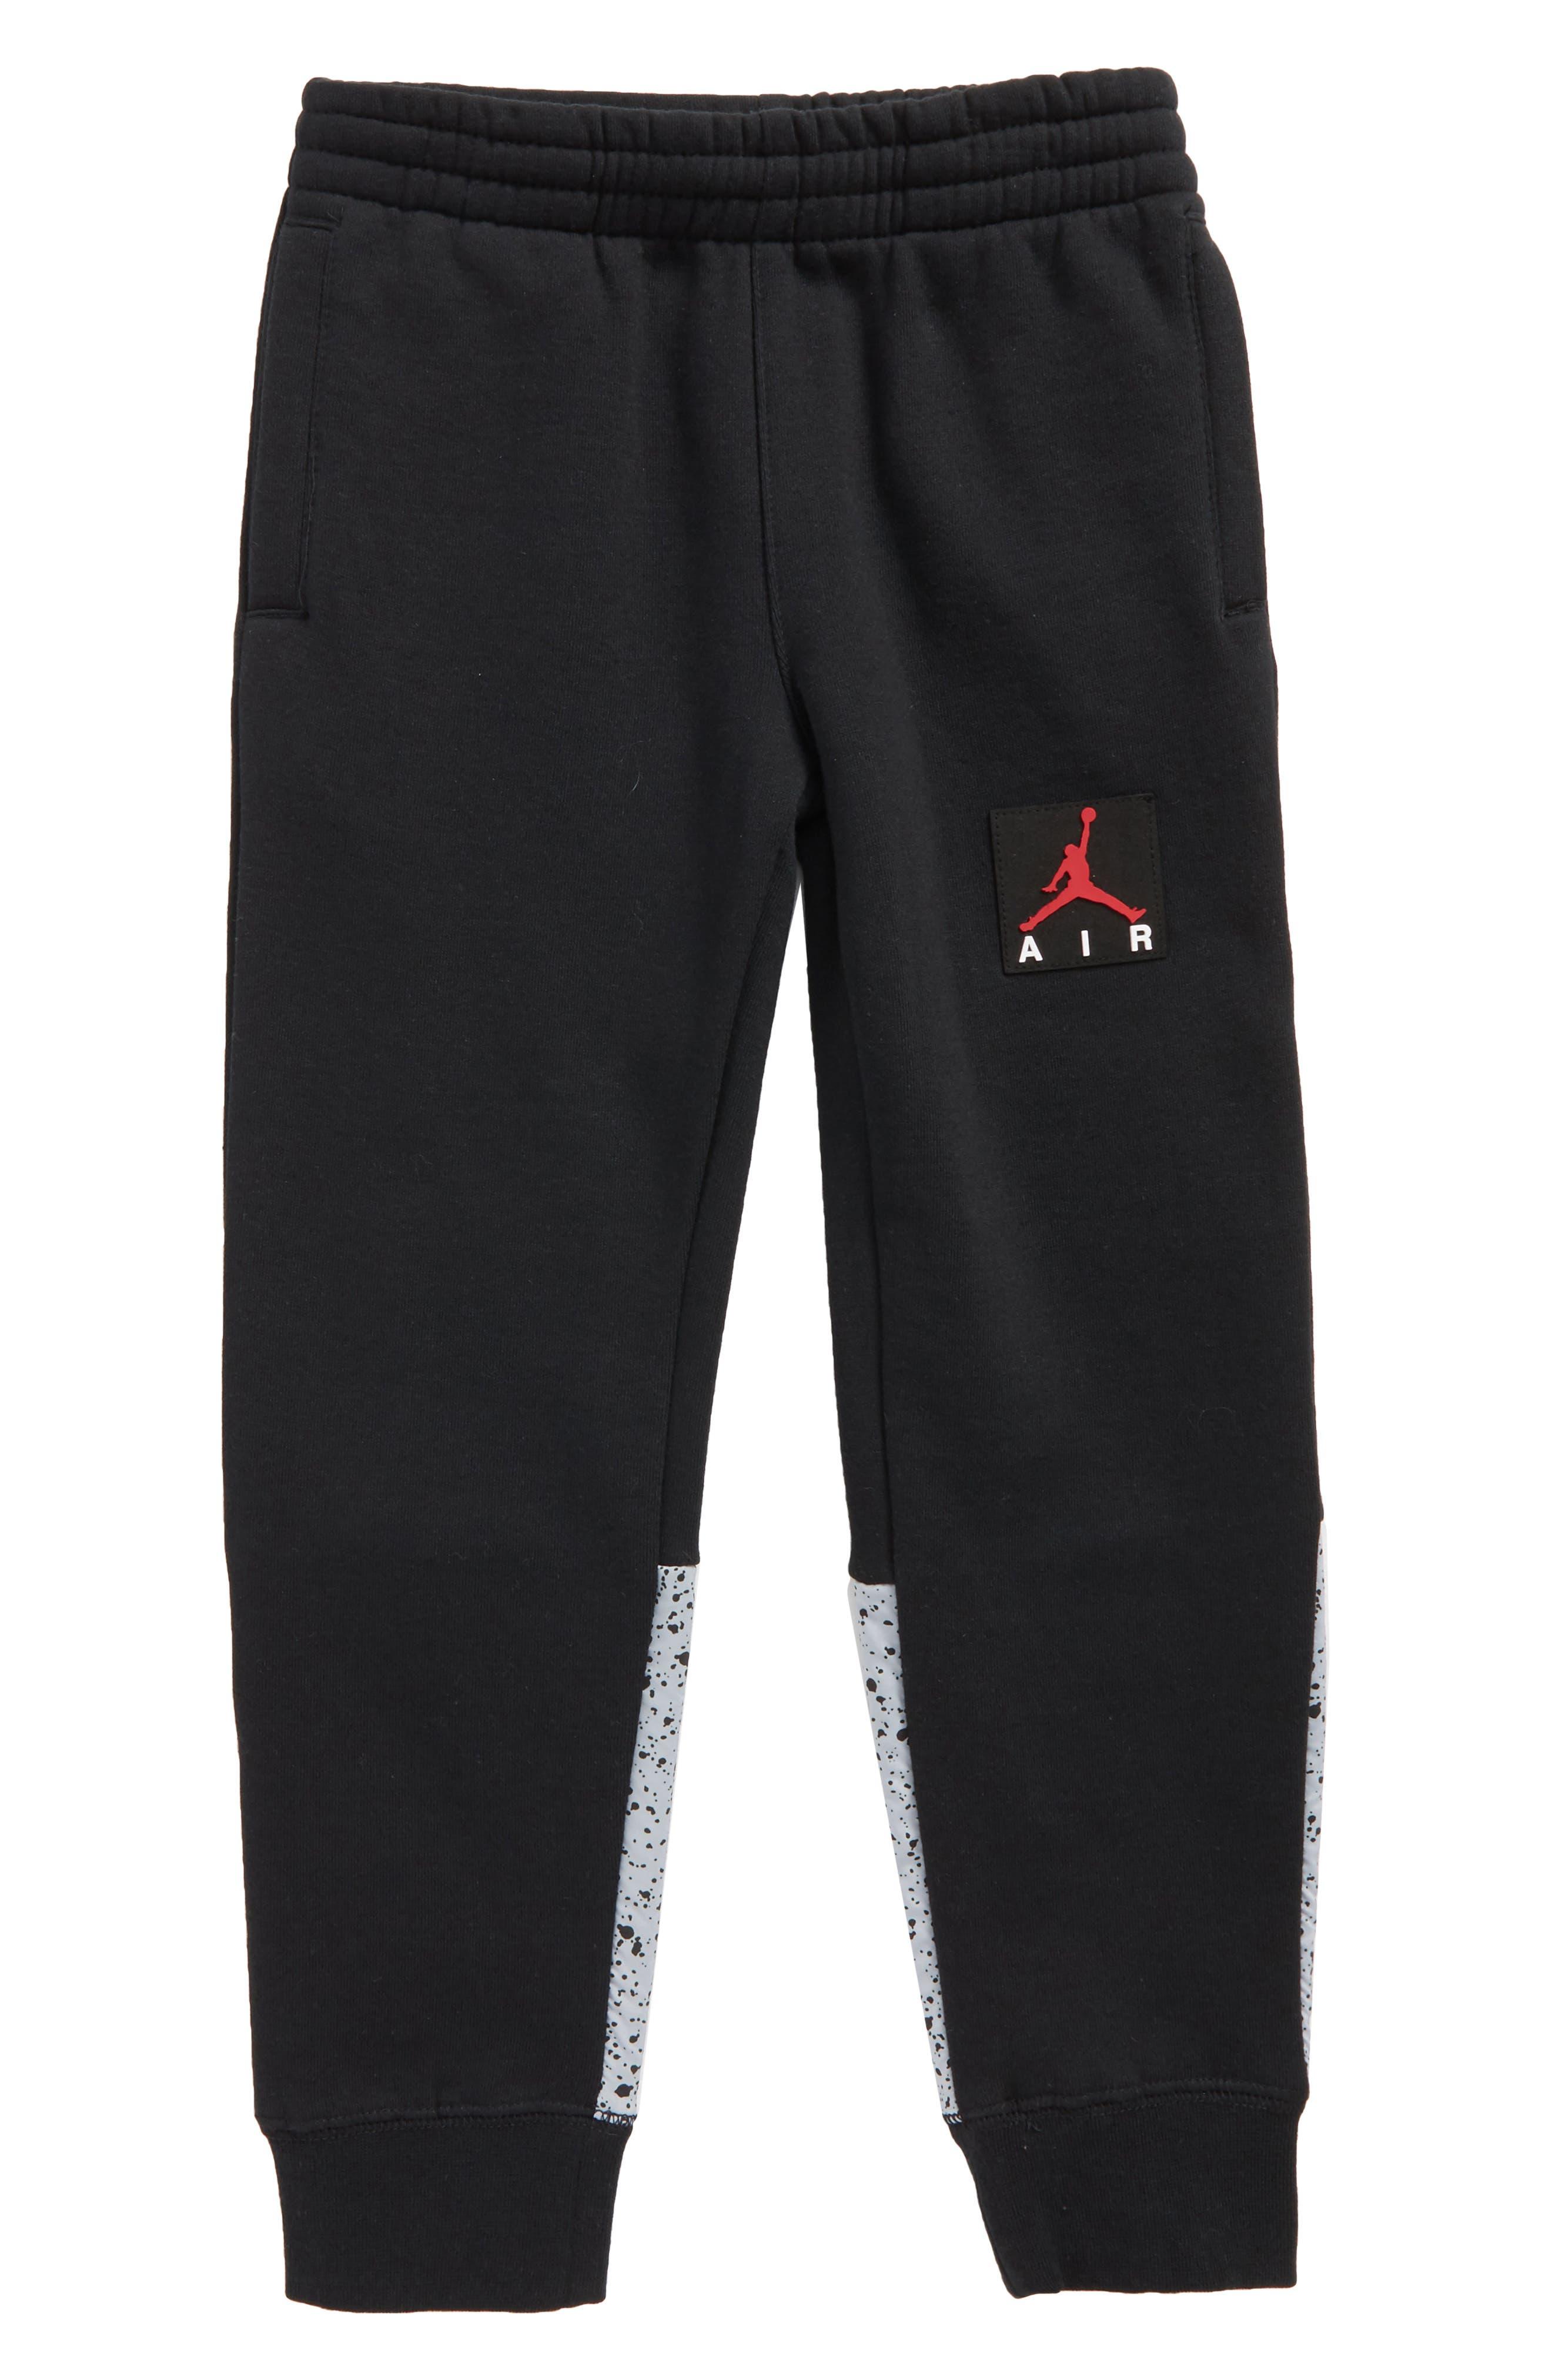 Main Image - Jordan Flight Sweatpants (Toddler Boys & Little Boys)